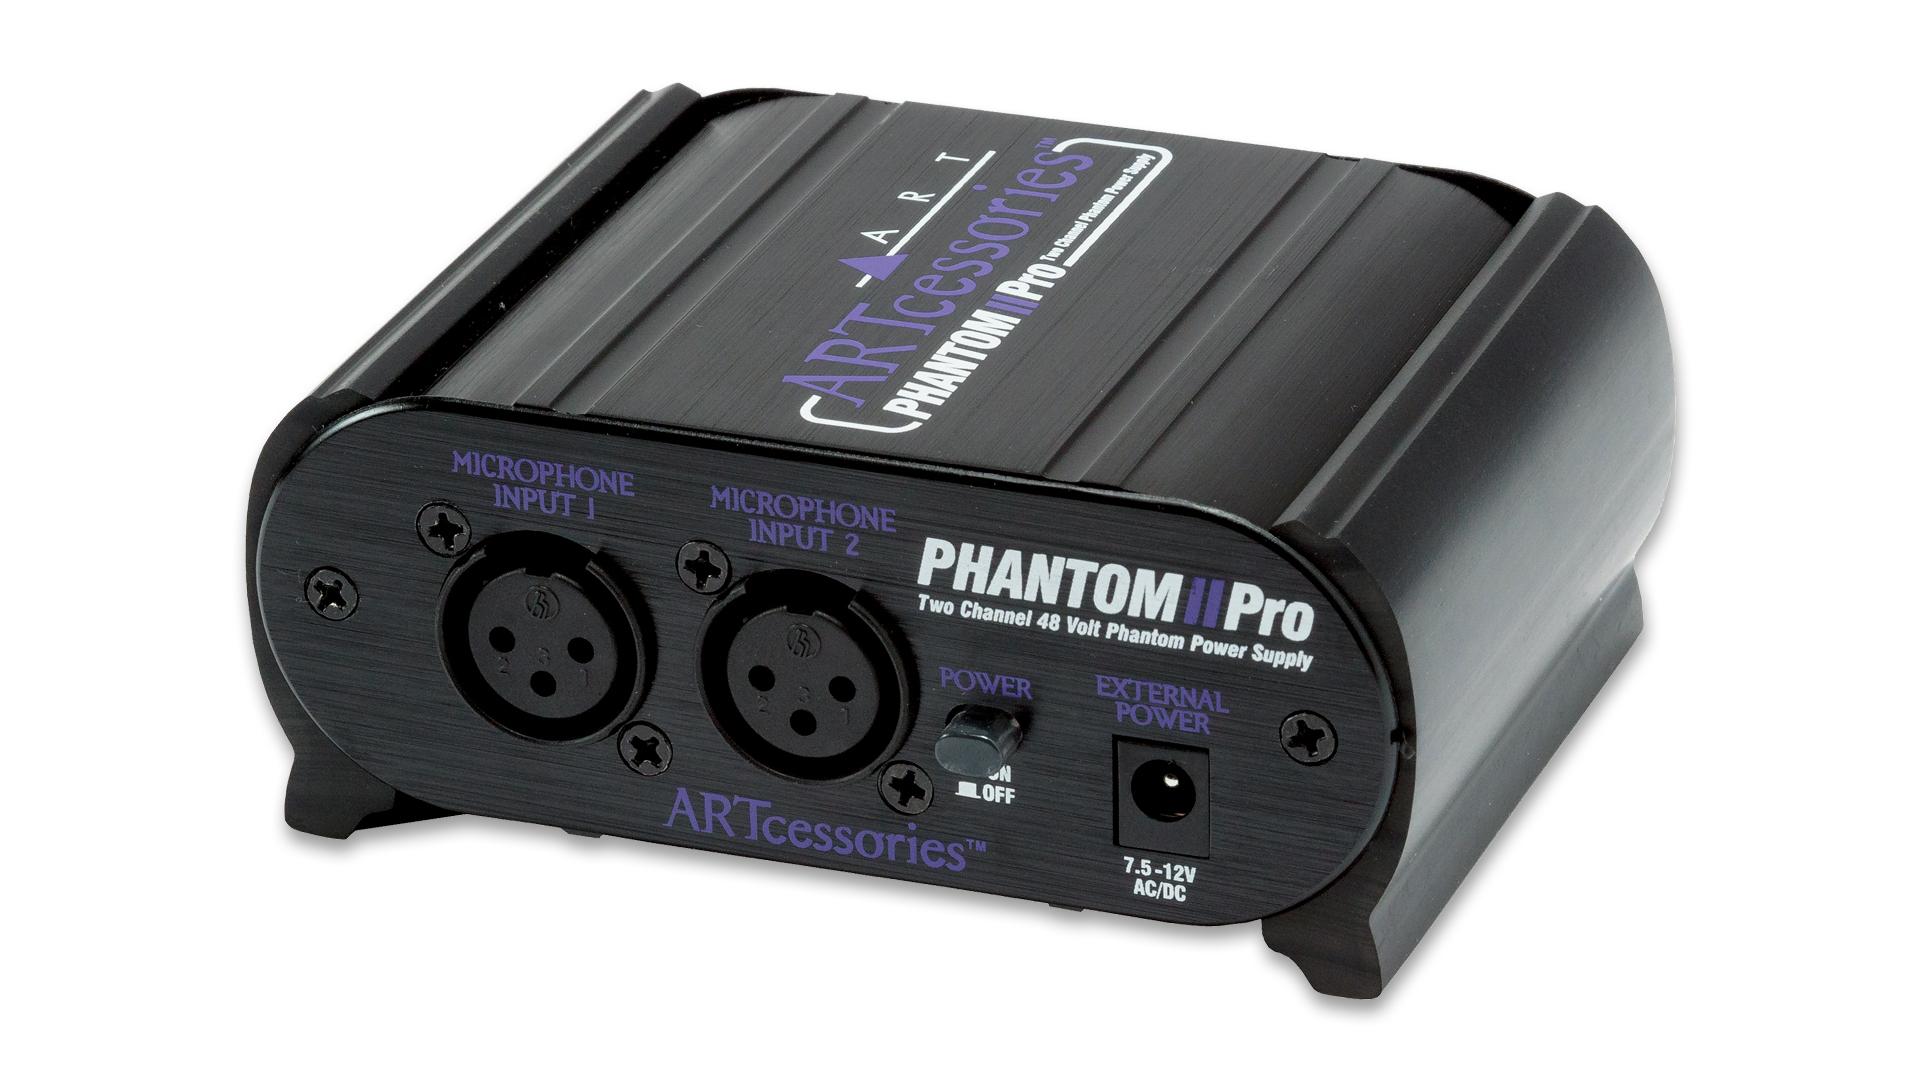 Phantom Ii Pro Dual Ch Power Supply Art Audio 12v Overview